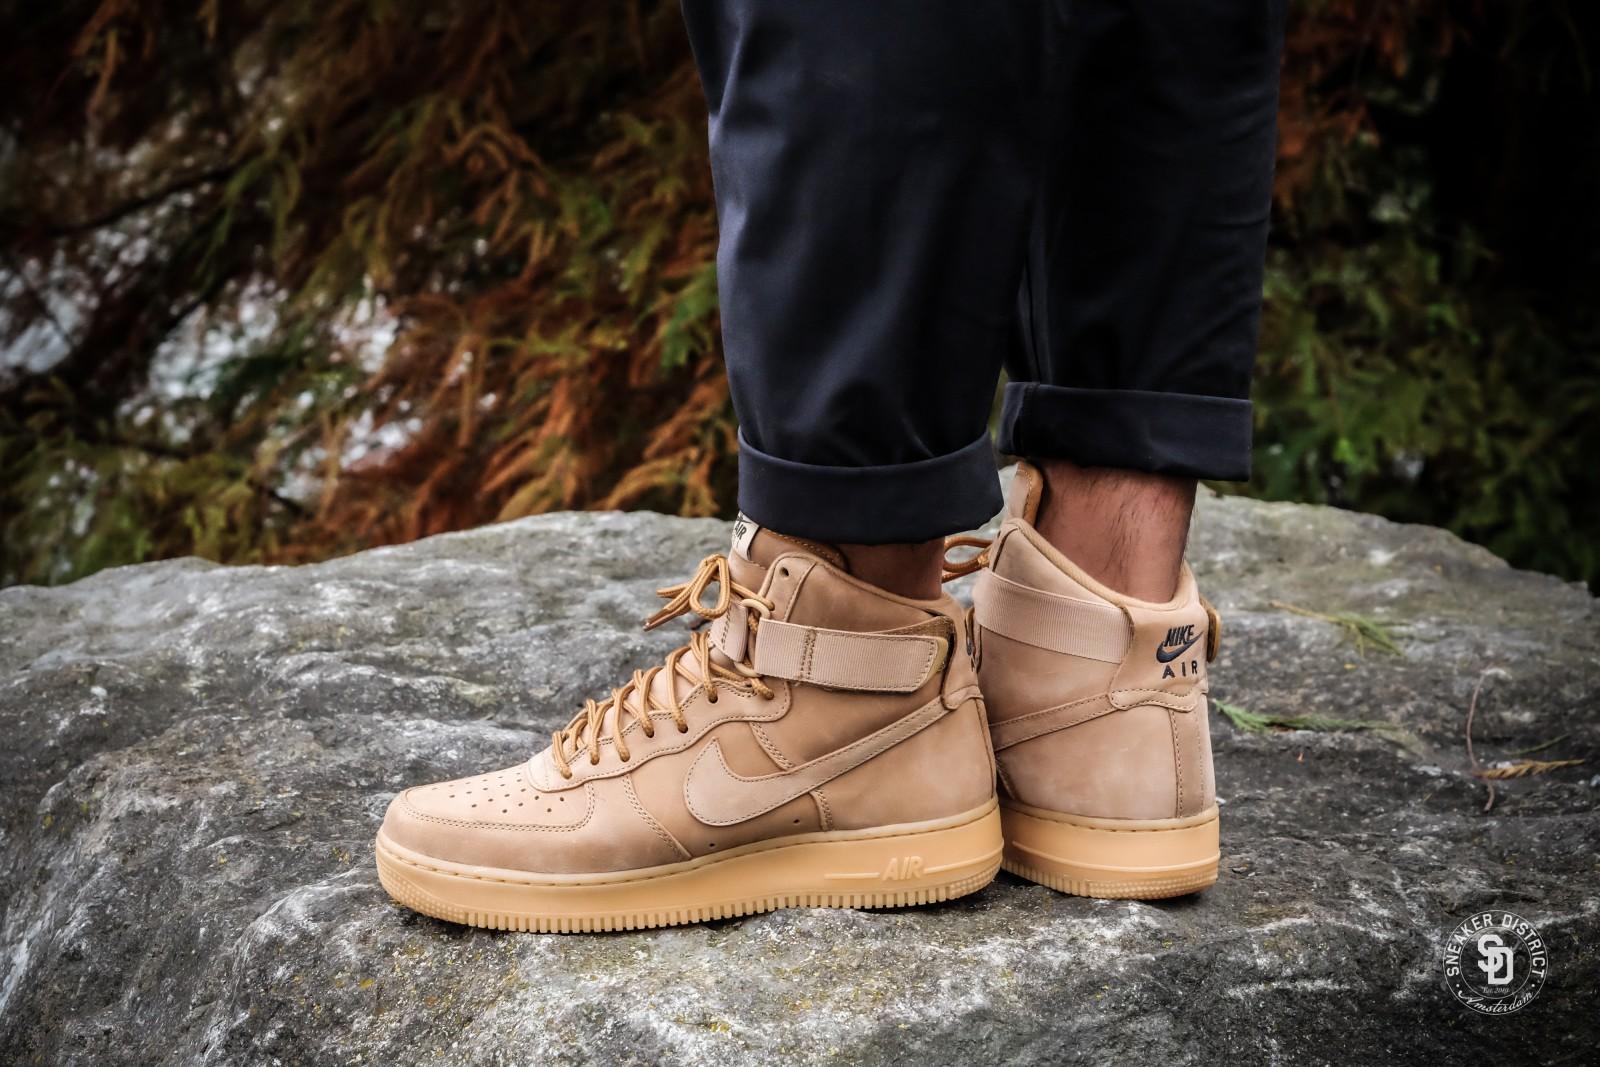 Nike Air Force 1 Hi 07 Lv8 Beige Gum